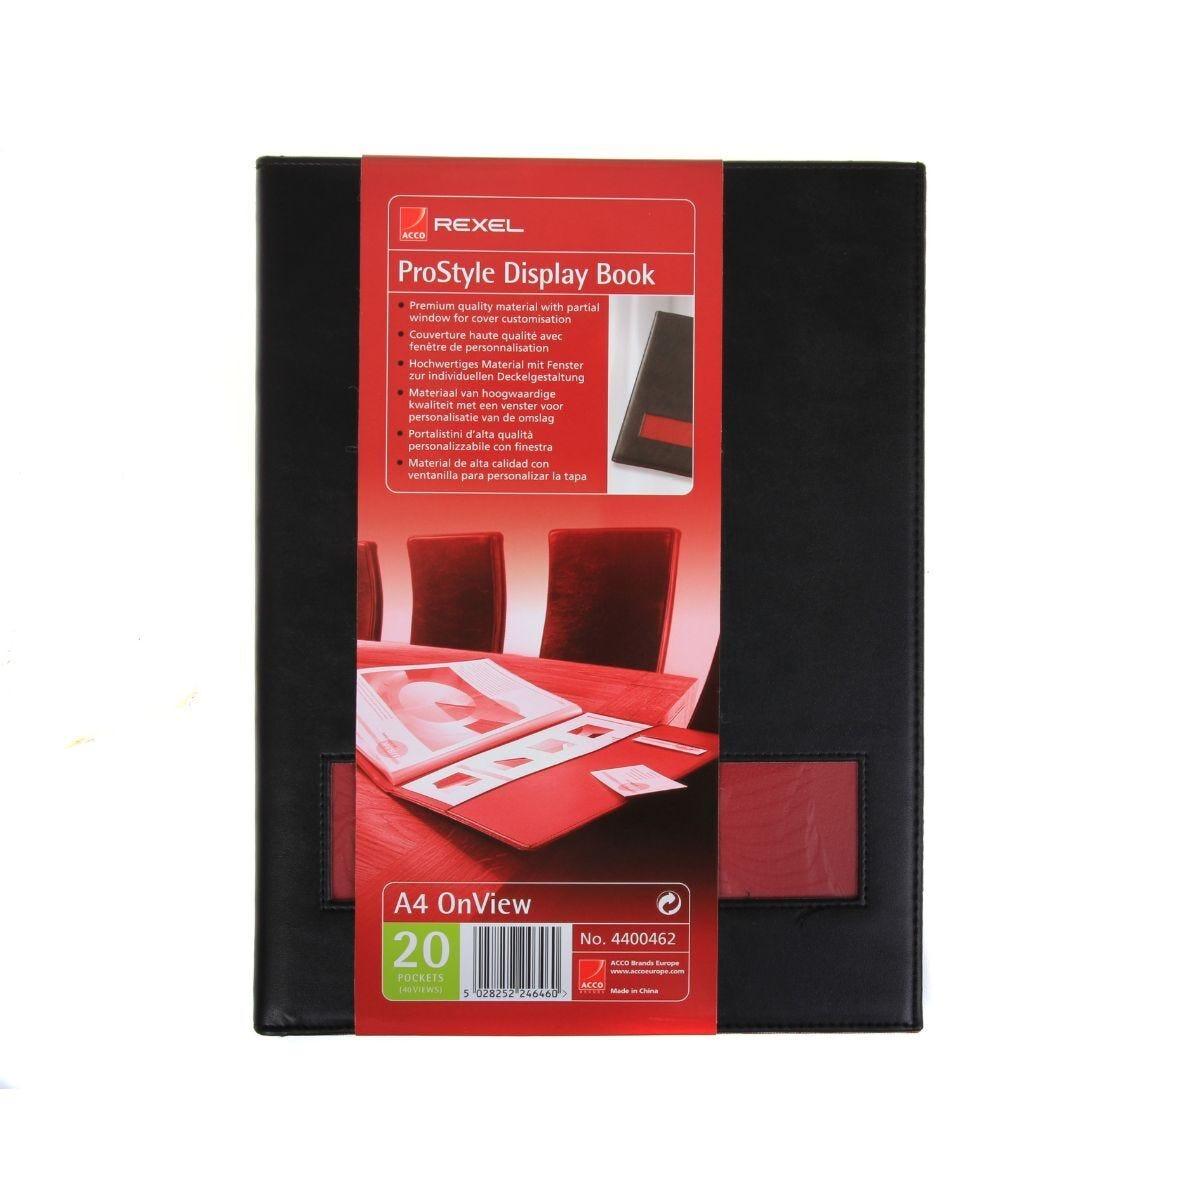 Rexel Prostyle Display Book 20 Pocket